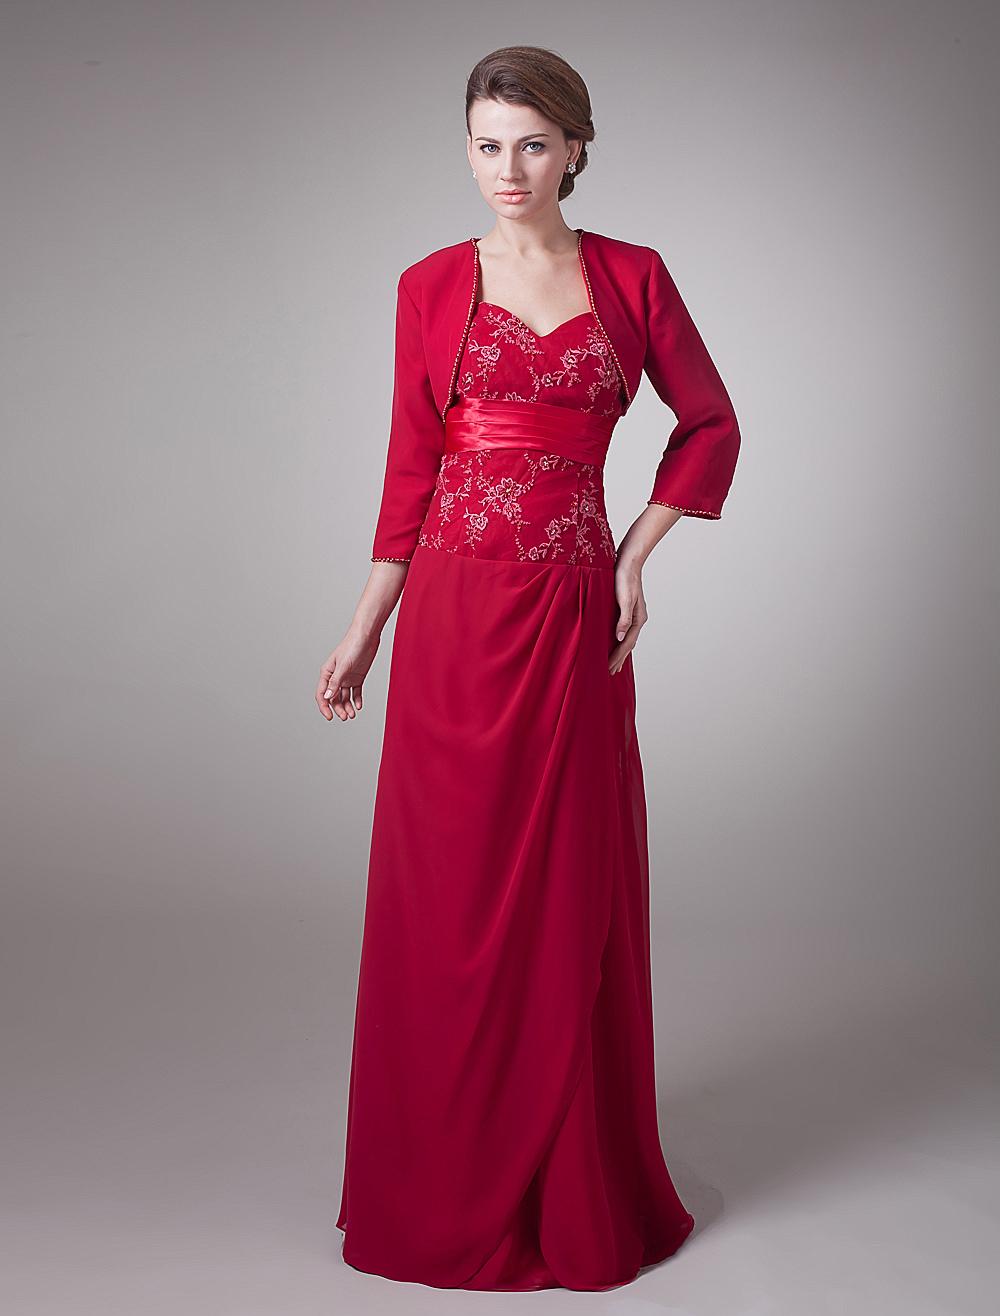 Burgundy Sheath Sweetheart Embroidered Chiffon Bridal Mother Dress